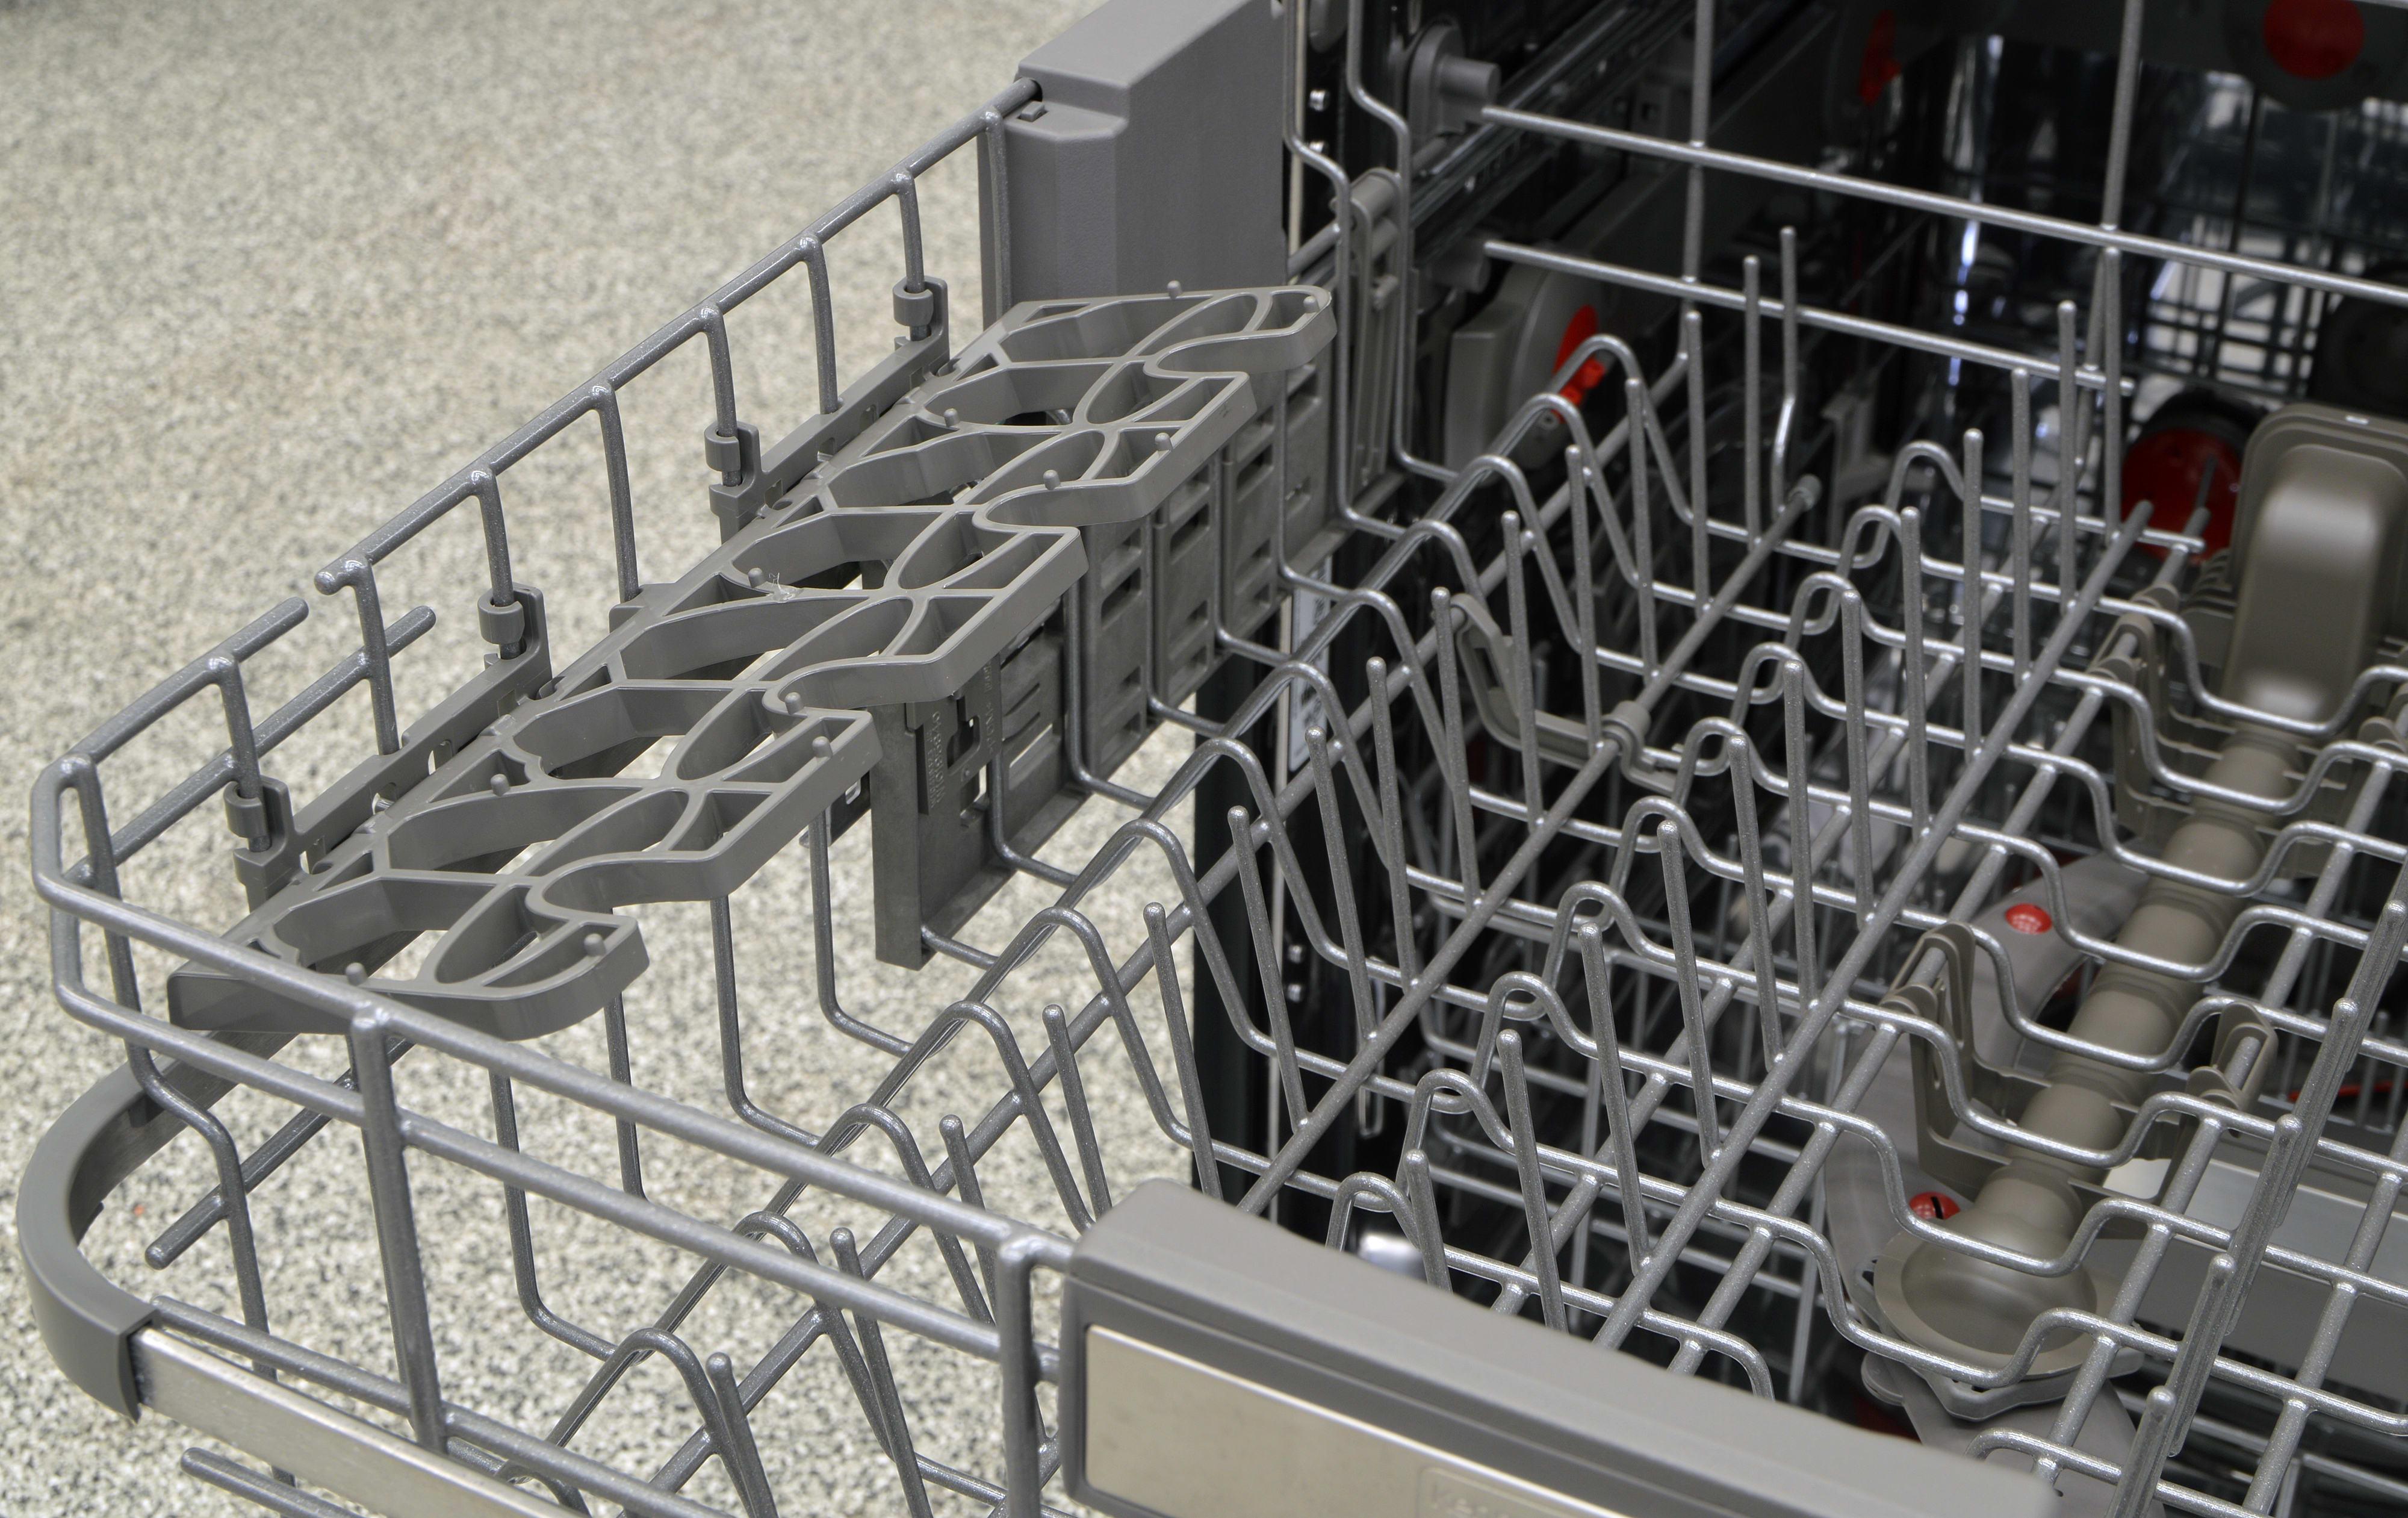 A fold-down shelf on the upper rack